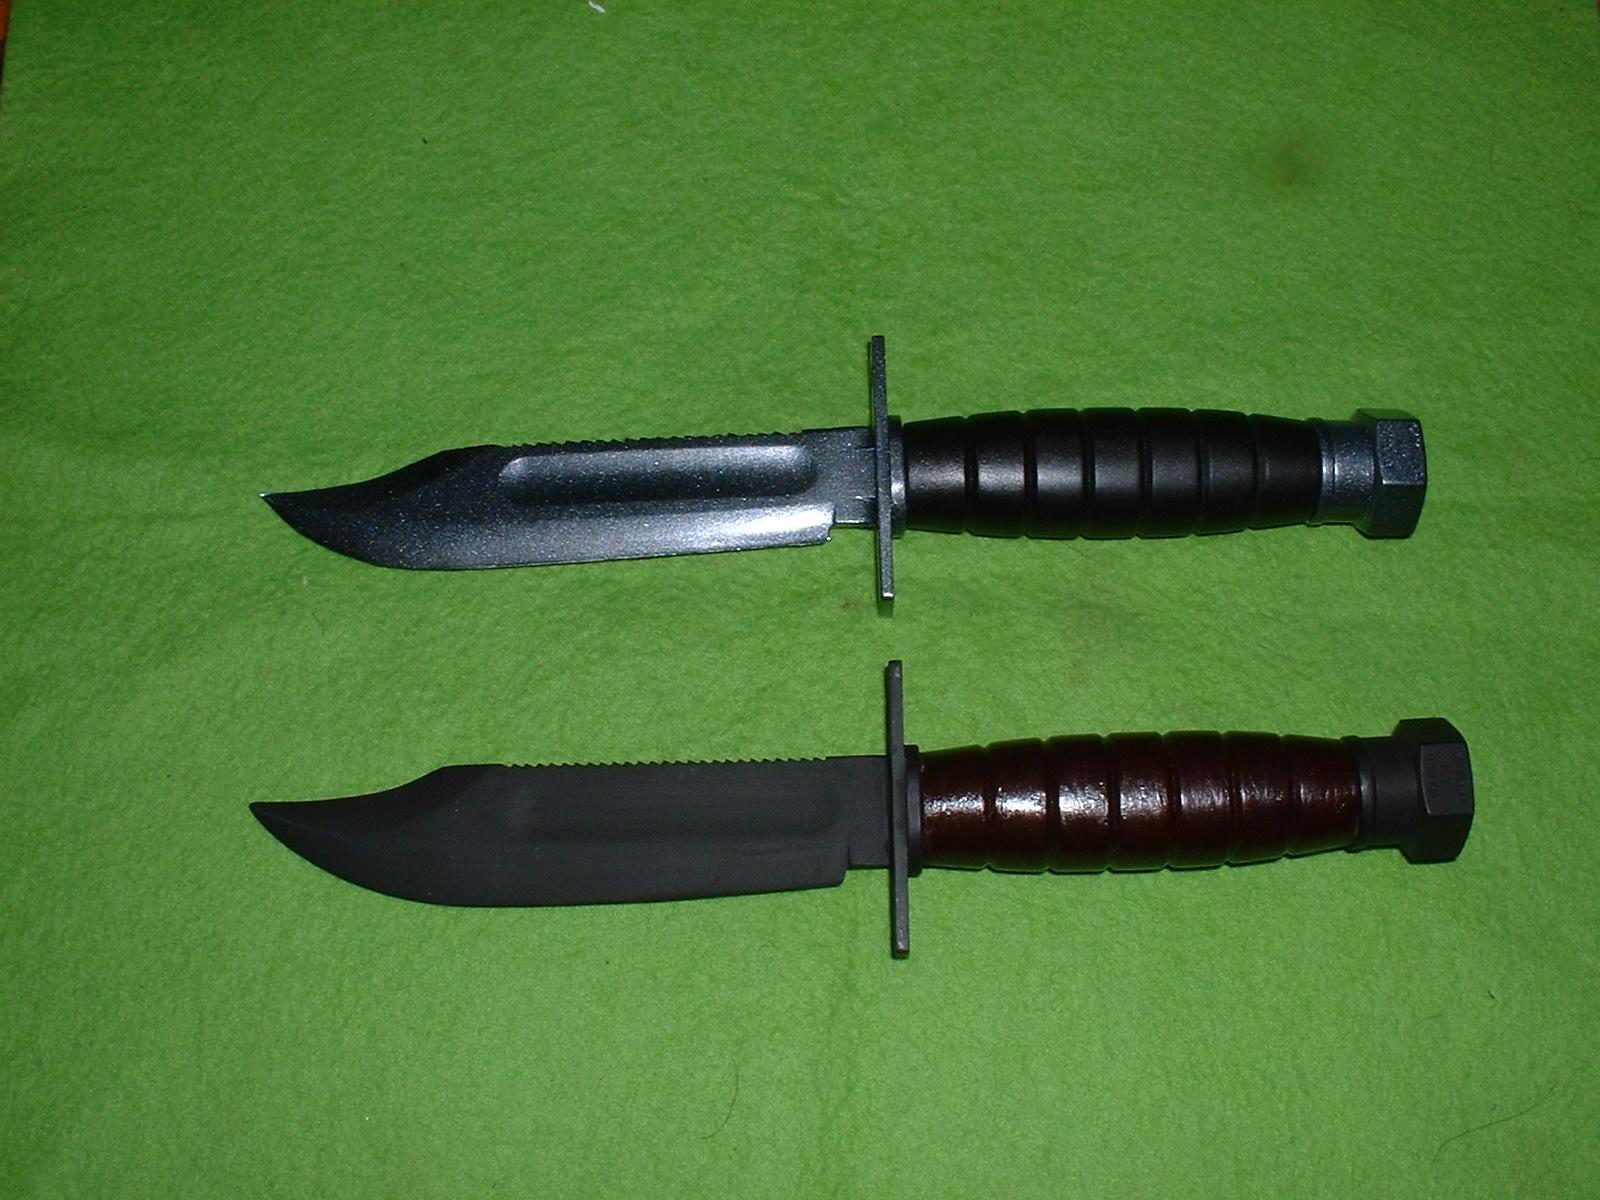 LS(現 マイクロエース)  『U.S.コンバットナイフ』2種 「ゴム刃」版(上)と「プラ刃」版(下) Doburoku-TAO.JPG